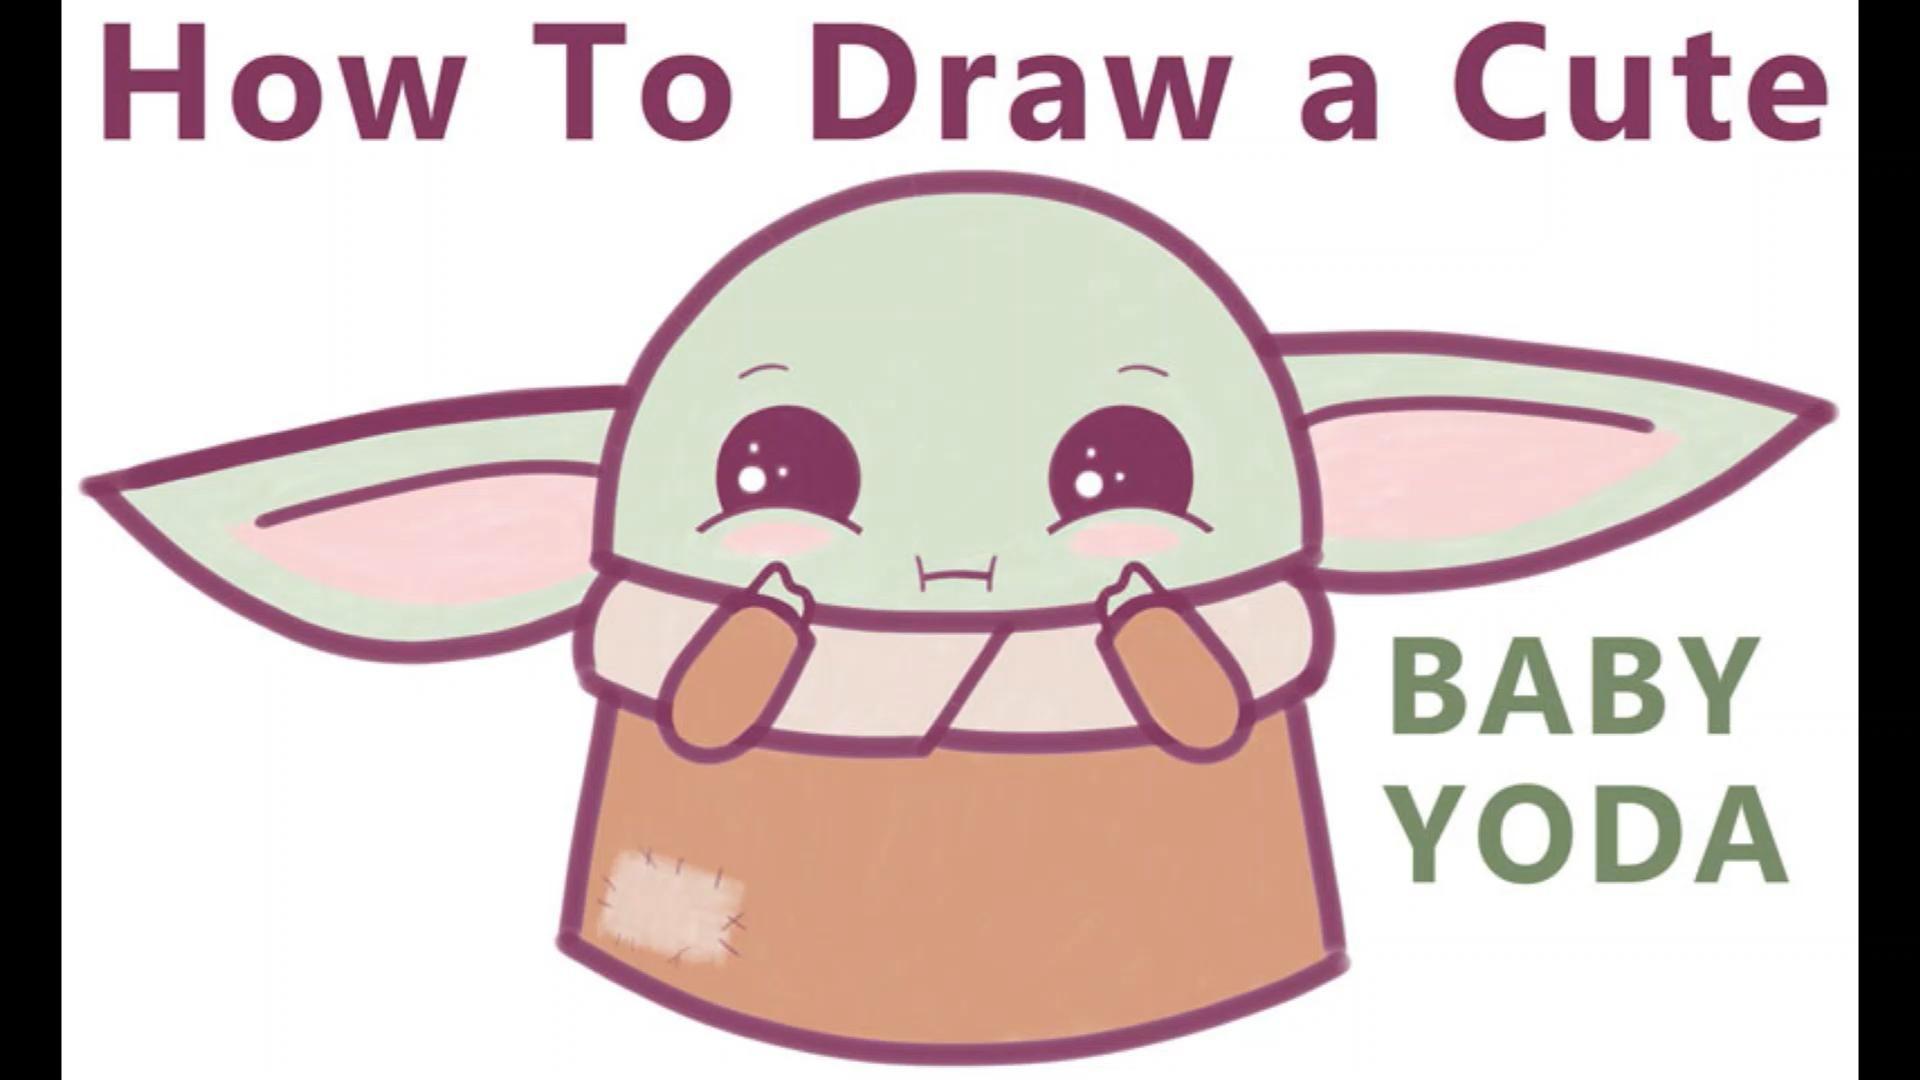 How To Draw A Cute Cartoon Baby Yoda Kawaii Chibi Easy Step By Step Drawing Tutorial How To Draw Step By Step Drawing Tutorials Video Video Cute Cartoon Drawings